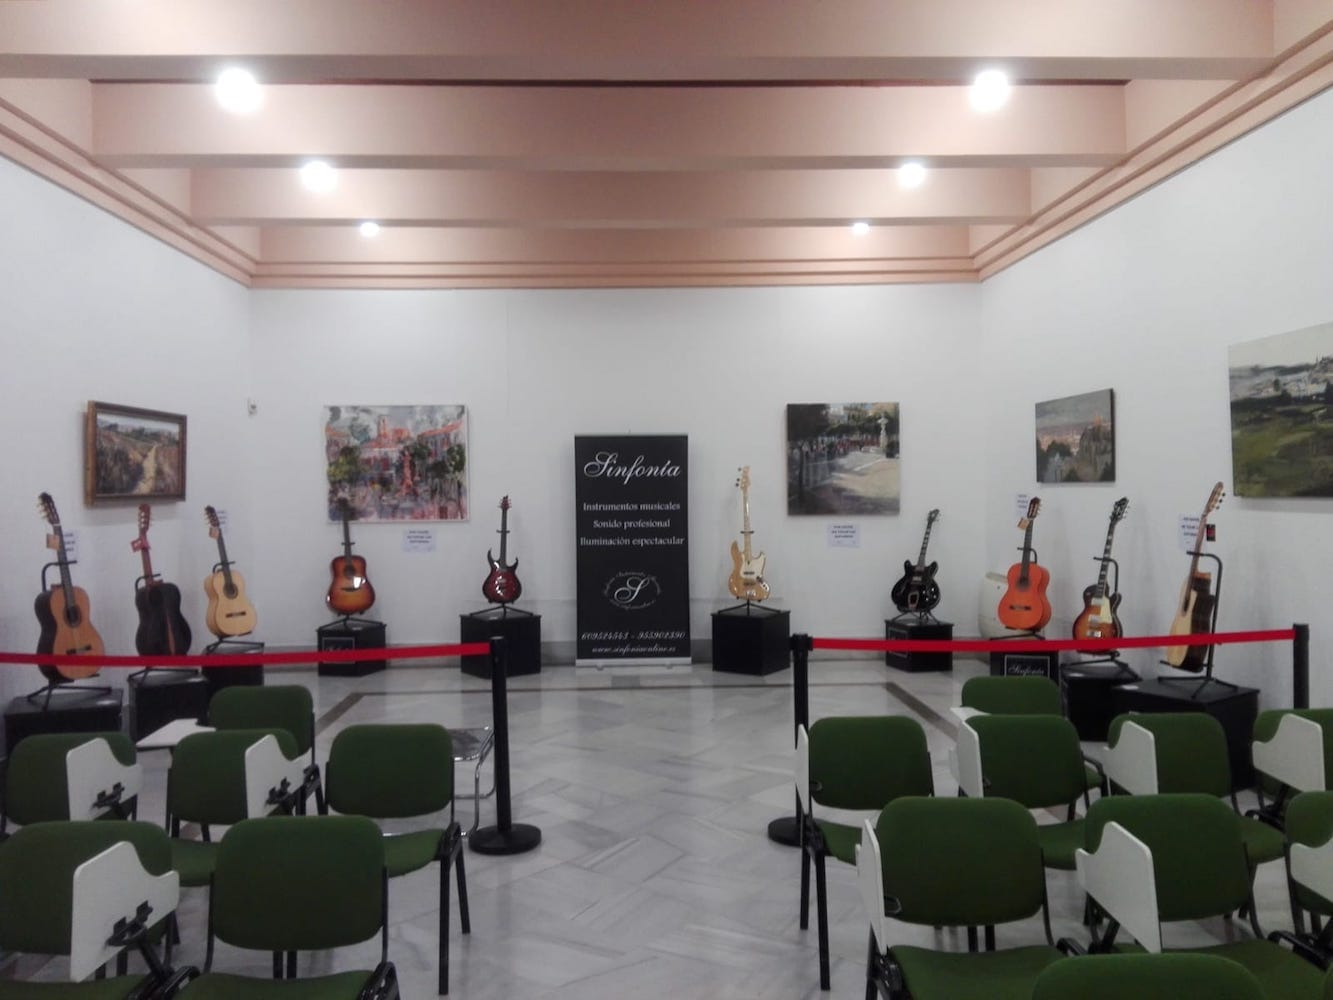 festival de la guitarra osuna